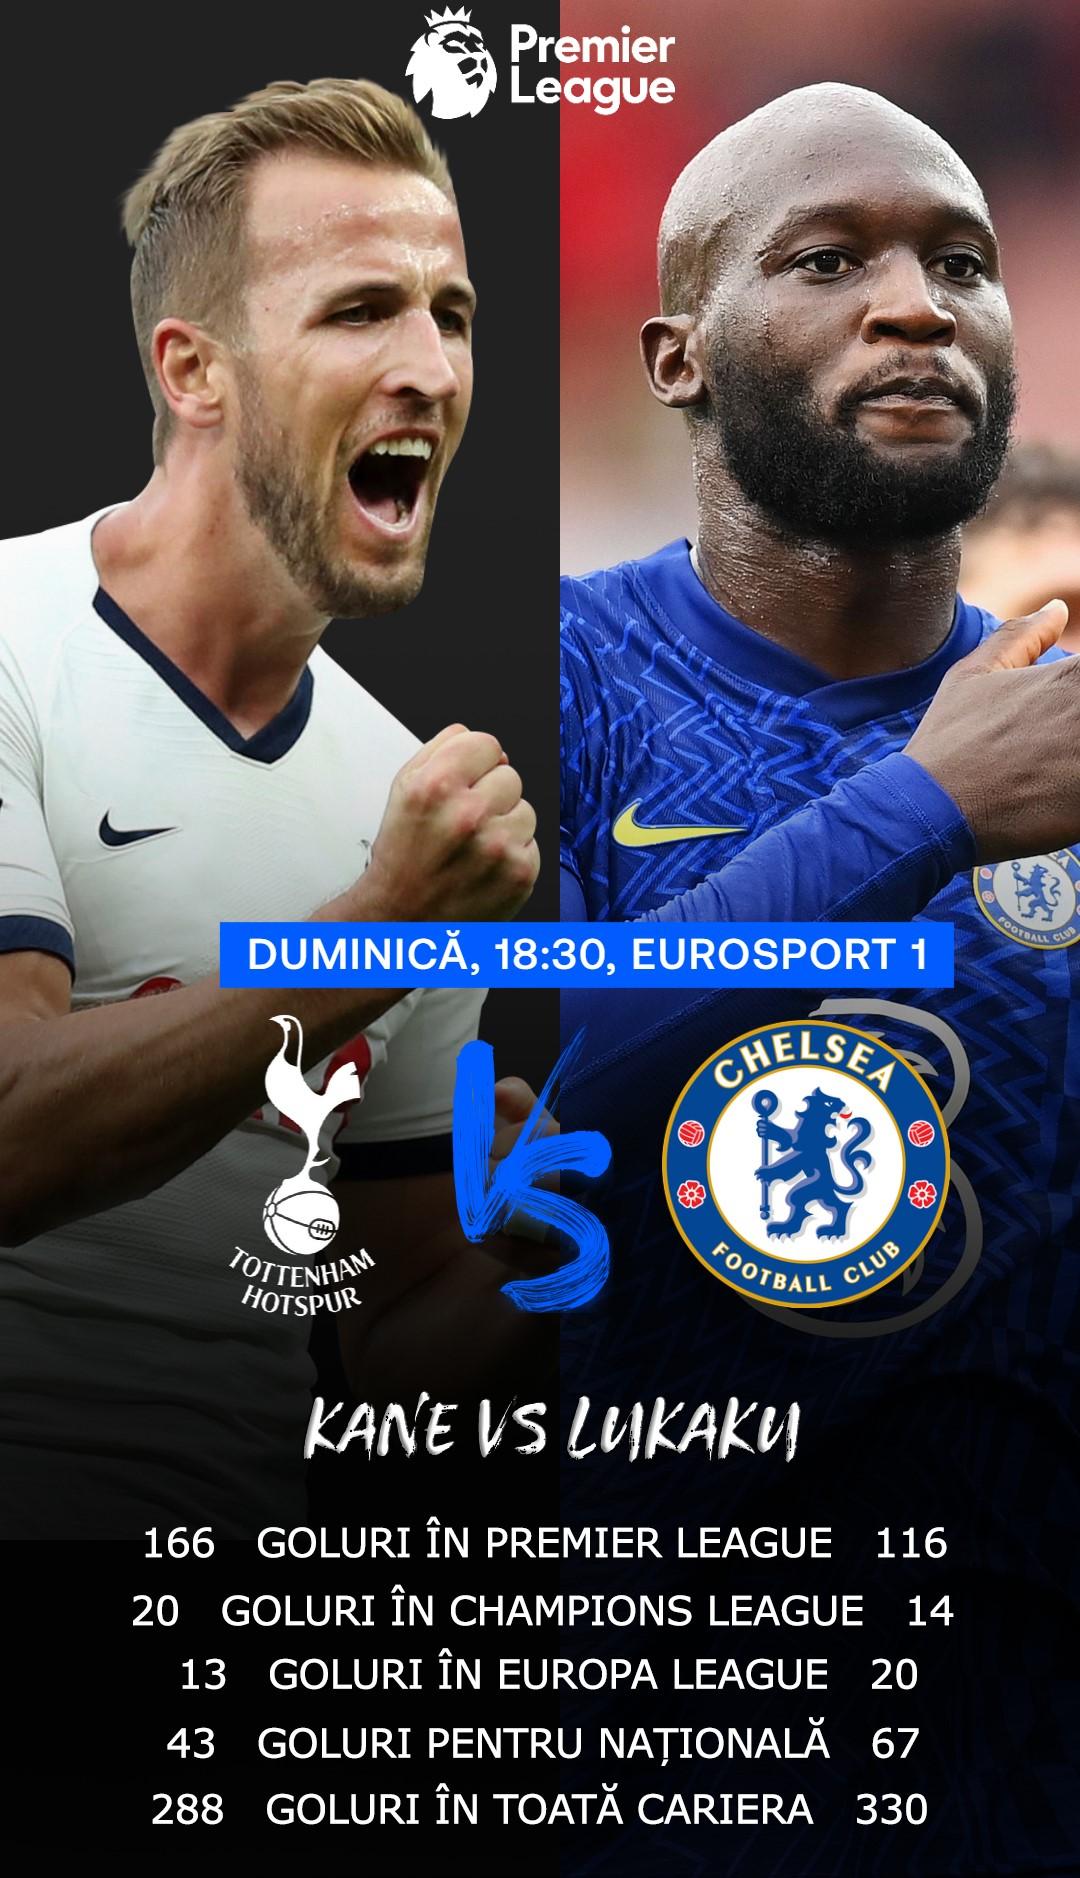 https://i.eurosport.com/2021/09/17/3221979.jpg